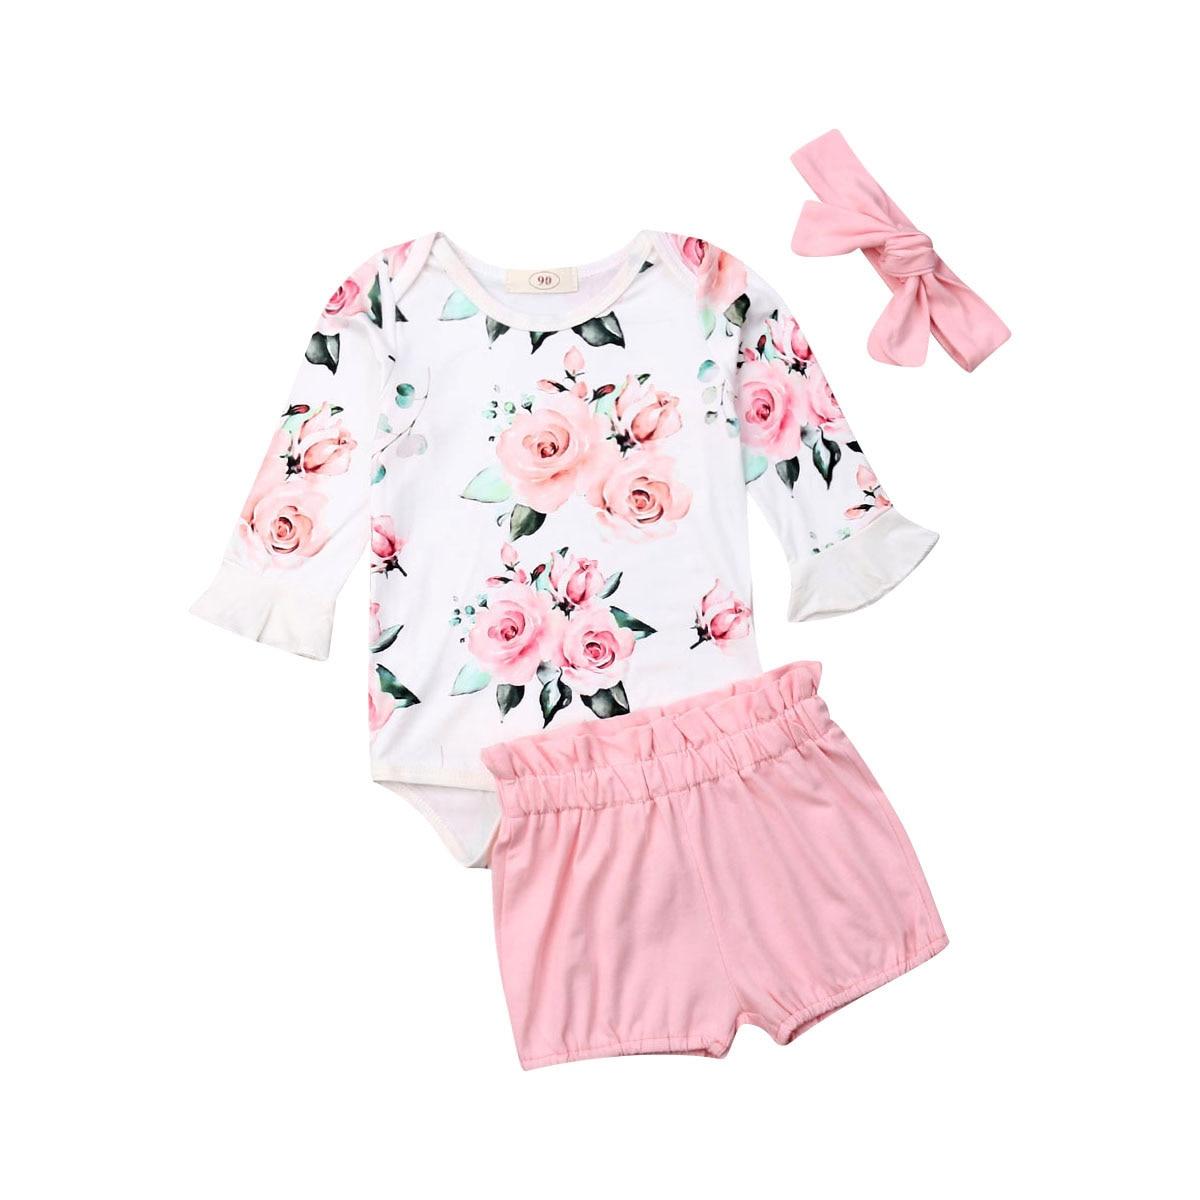 0-24M New Infant Kids Baby Girls Clothes Sets 3pcs Flowers Print Ruffles Long Sleeve Romper Tops+Pink Shorts+Headband